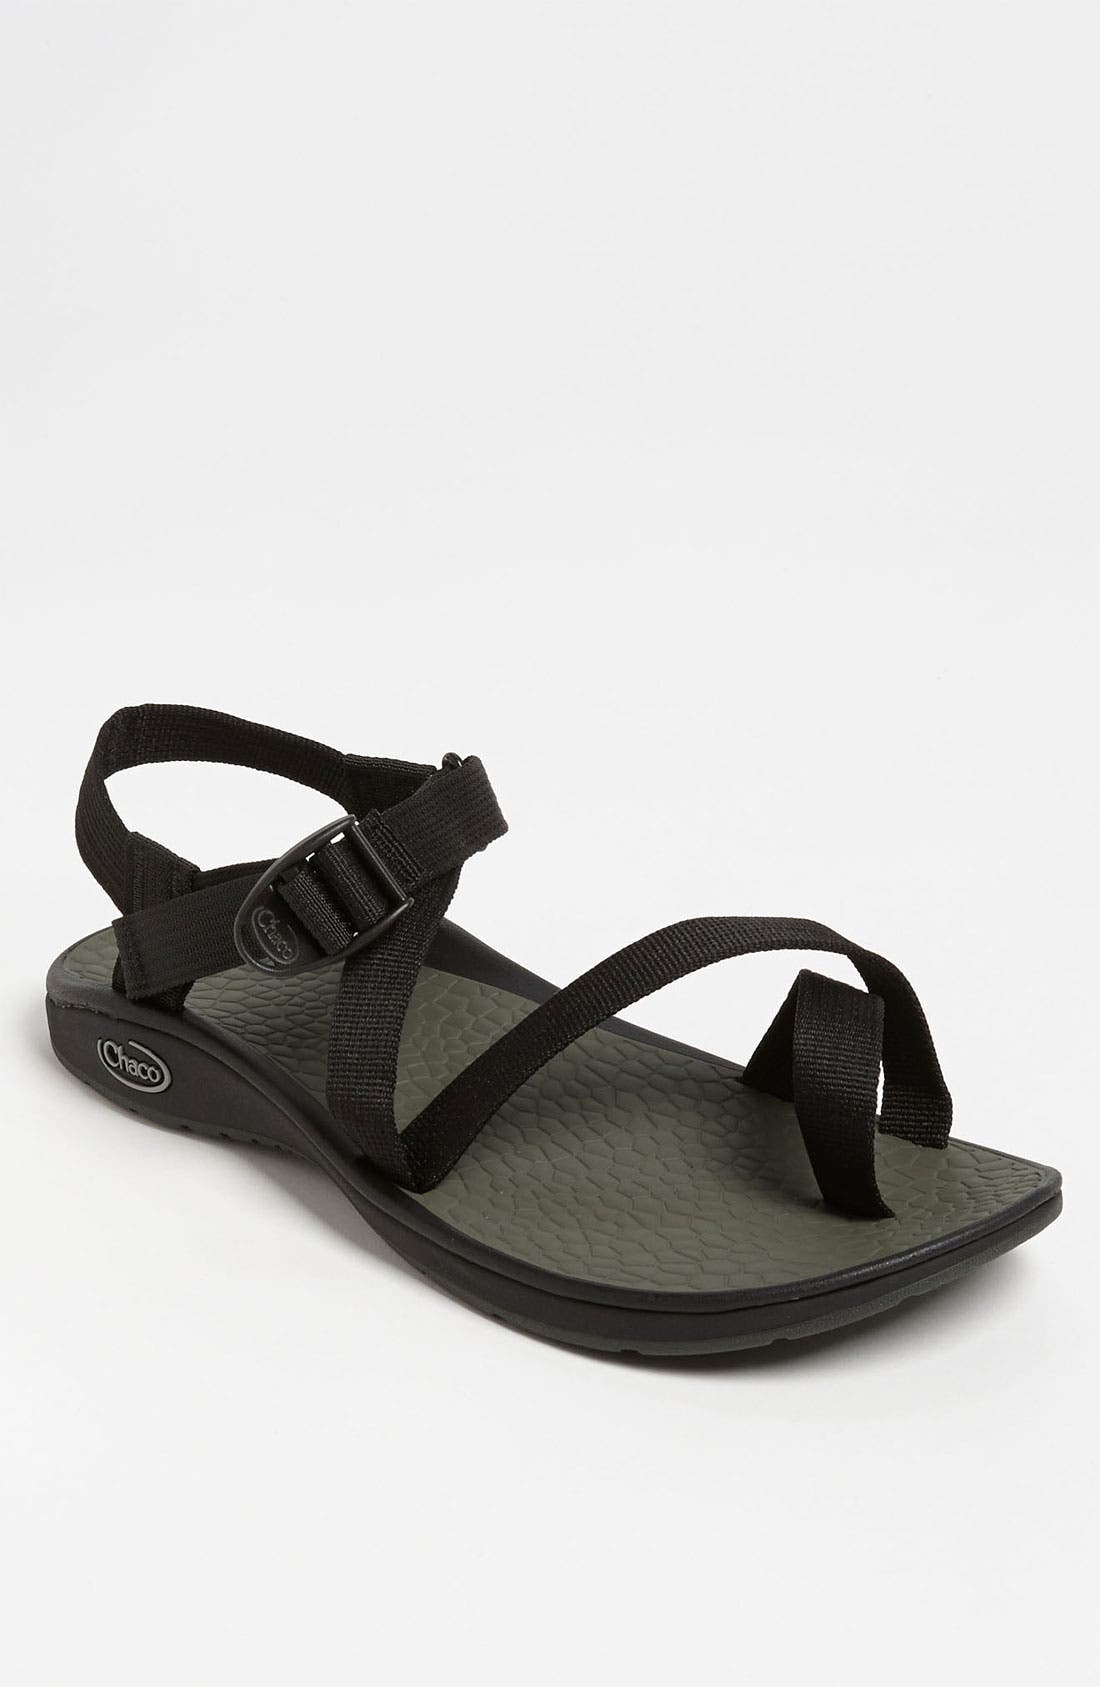 Alternate Image 1 Selected - Chaco 'Rex' Sandal (Men)